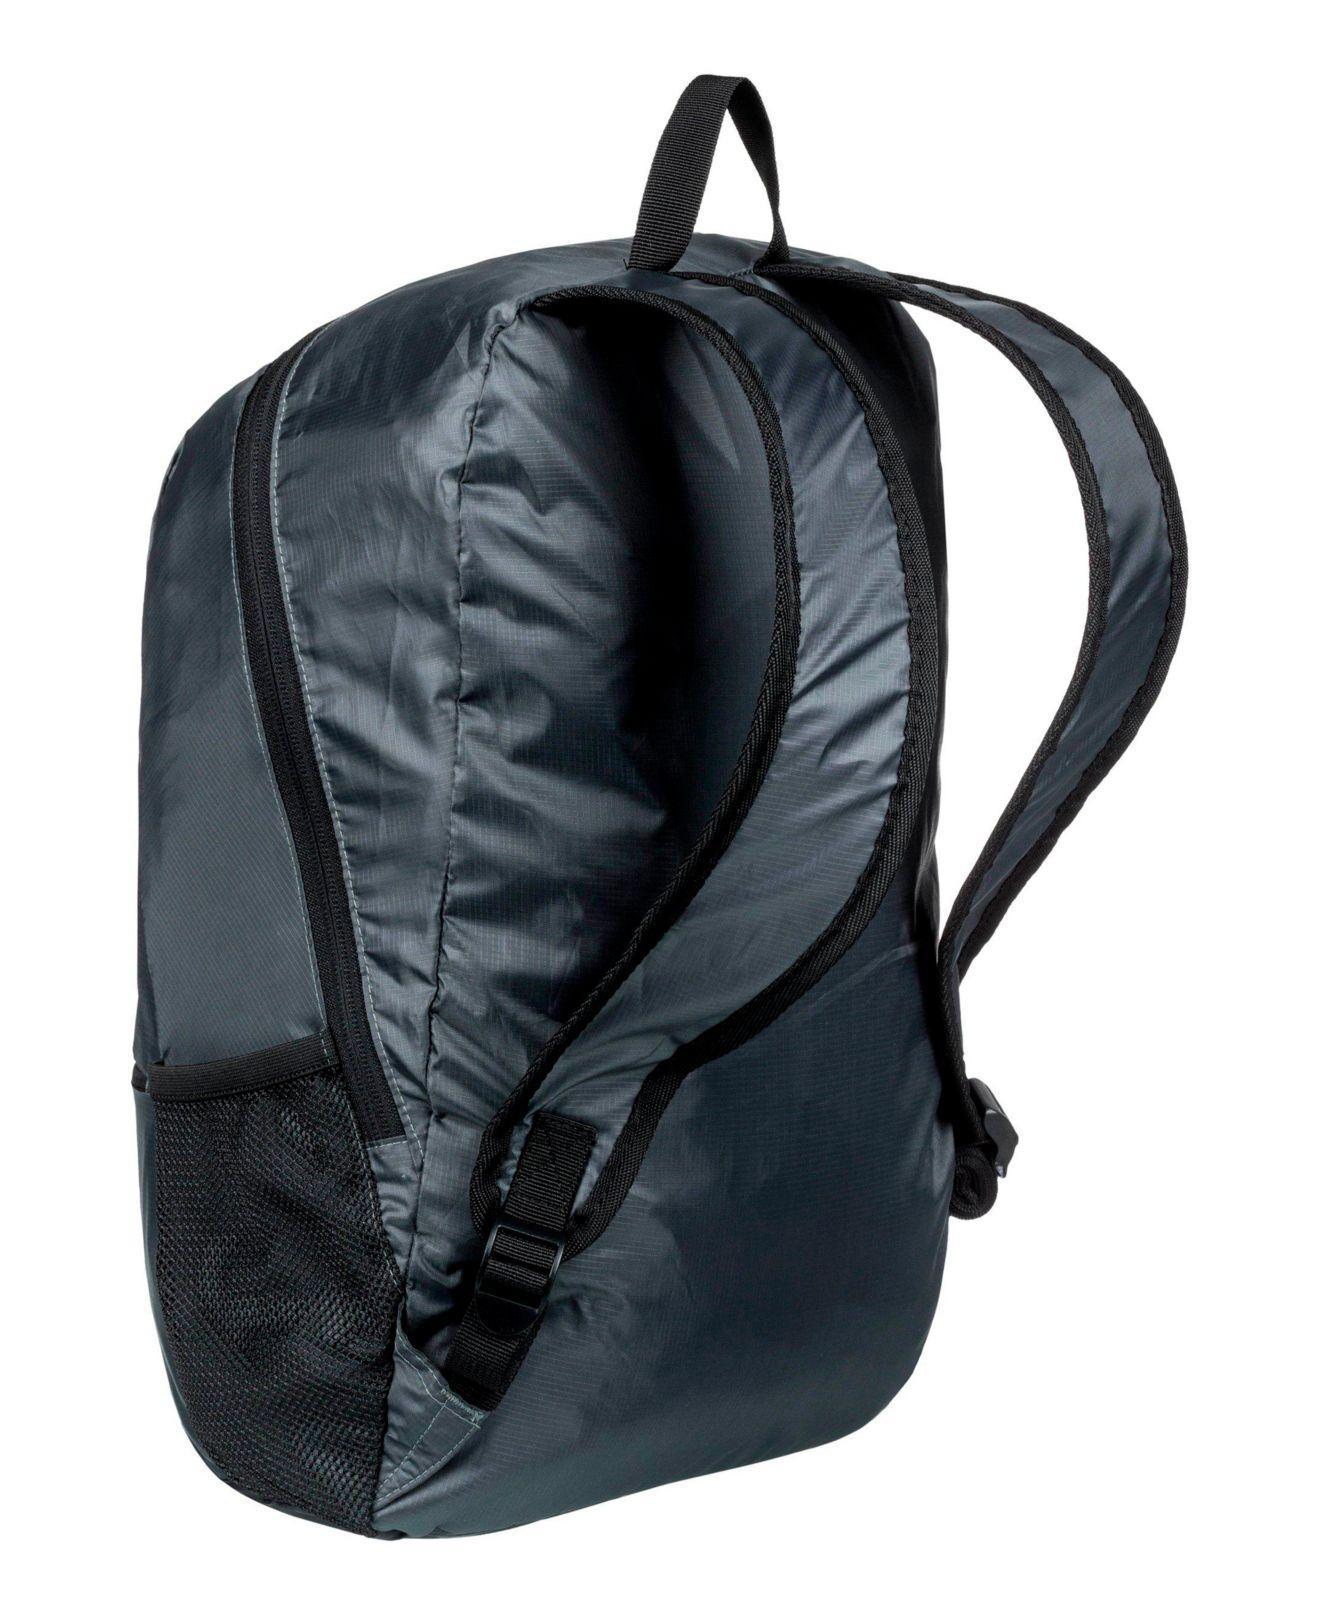 ac0fb5b69f82 Lyst - Quiksilver Medium Packable Backpack for Men